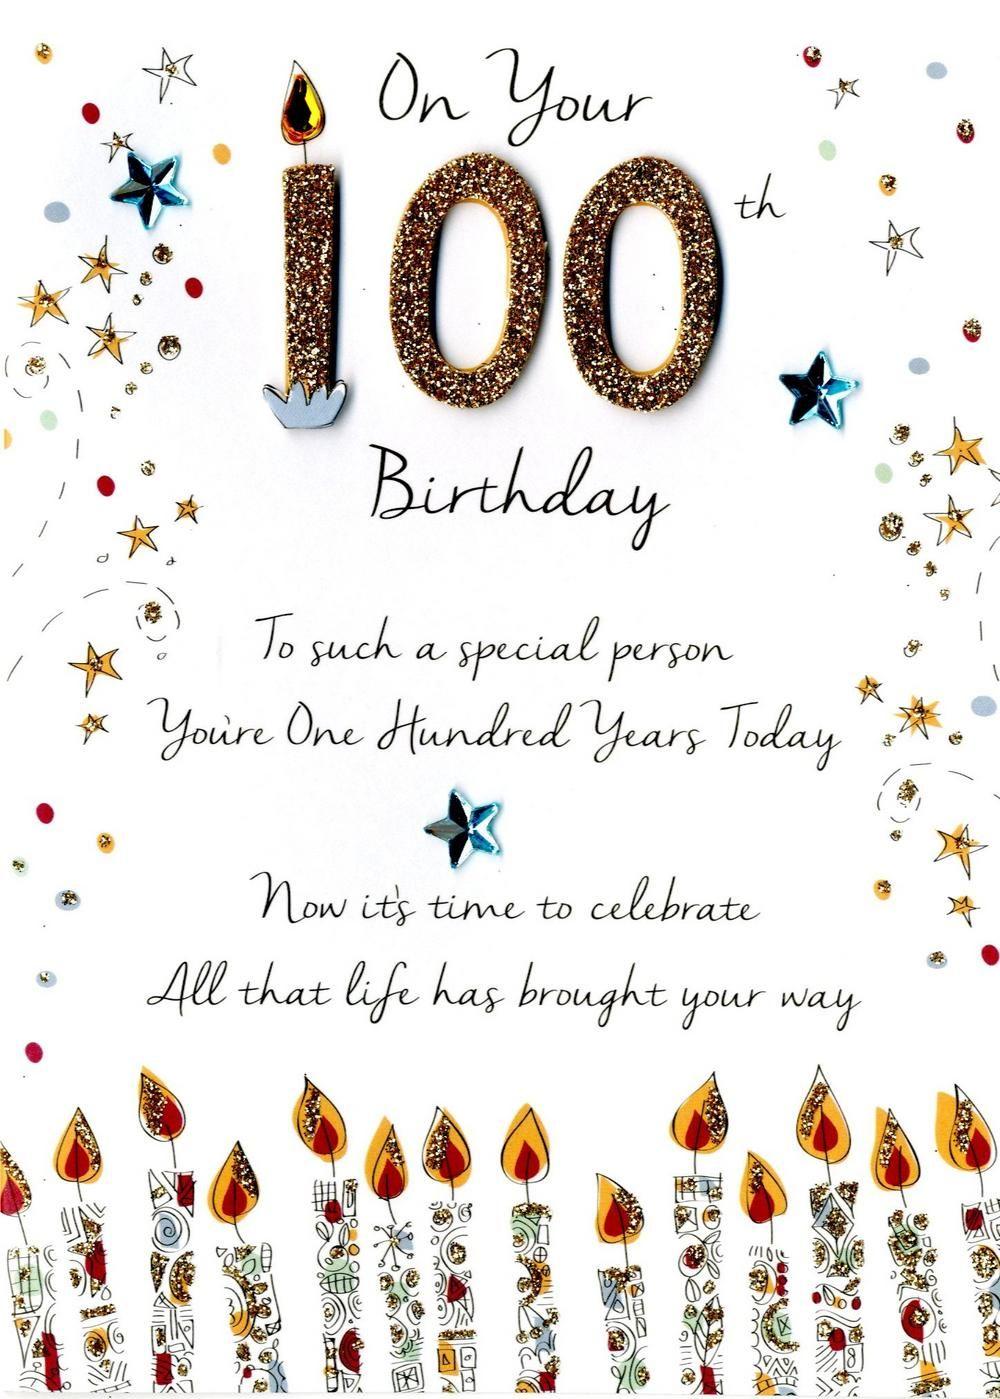 On Your 100th Birthday Greeting Card 100th Birthday Card Birthday Greeting Cards Birthday Card Messages